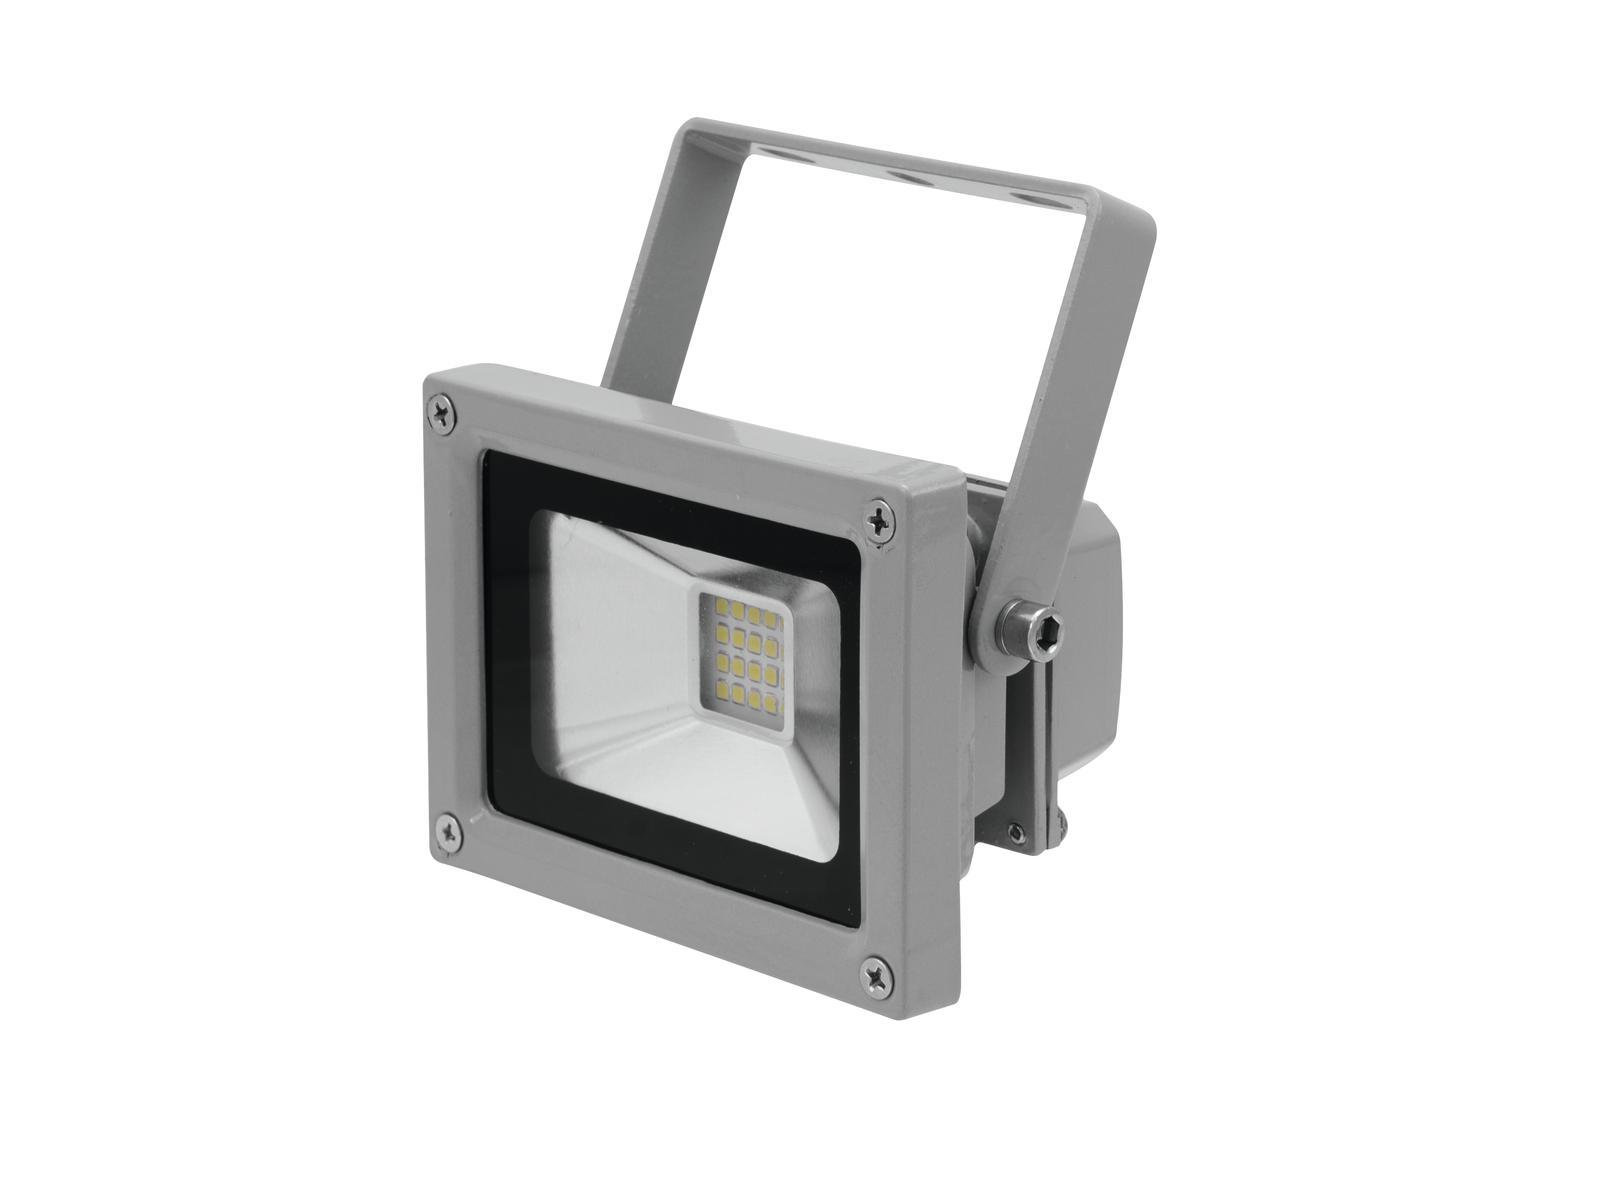 Eurolite LED reflektor IP FL-10, 20x0,6W LED, 3000K, 120, IP54